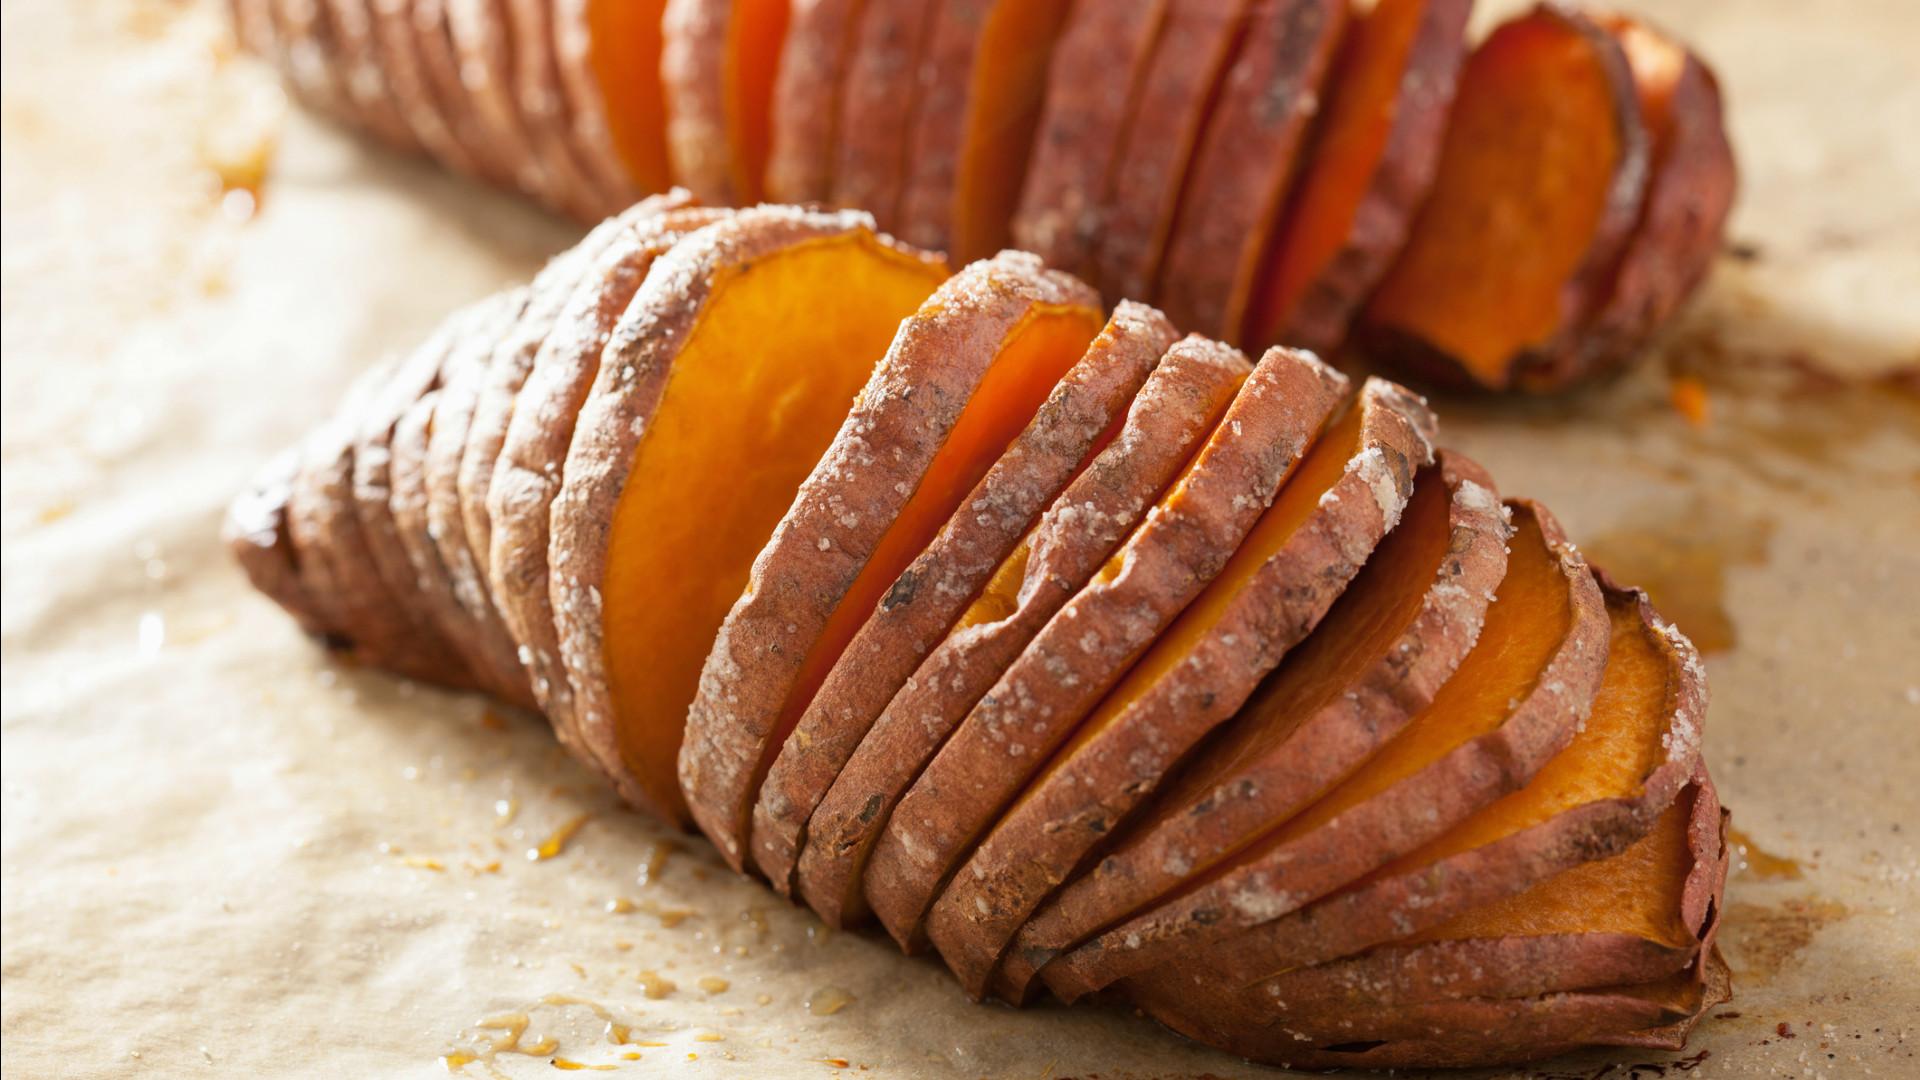 Baked Sweet Potato  Secret ingre nt Baked sweet potatoes are the key to